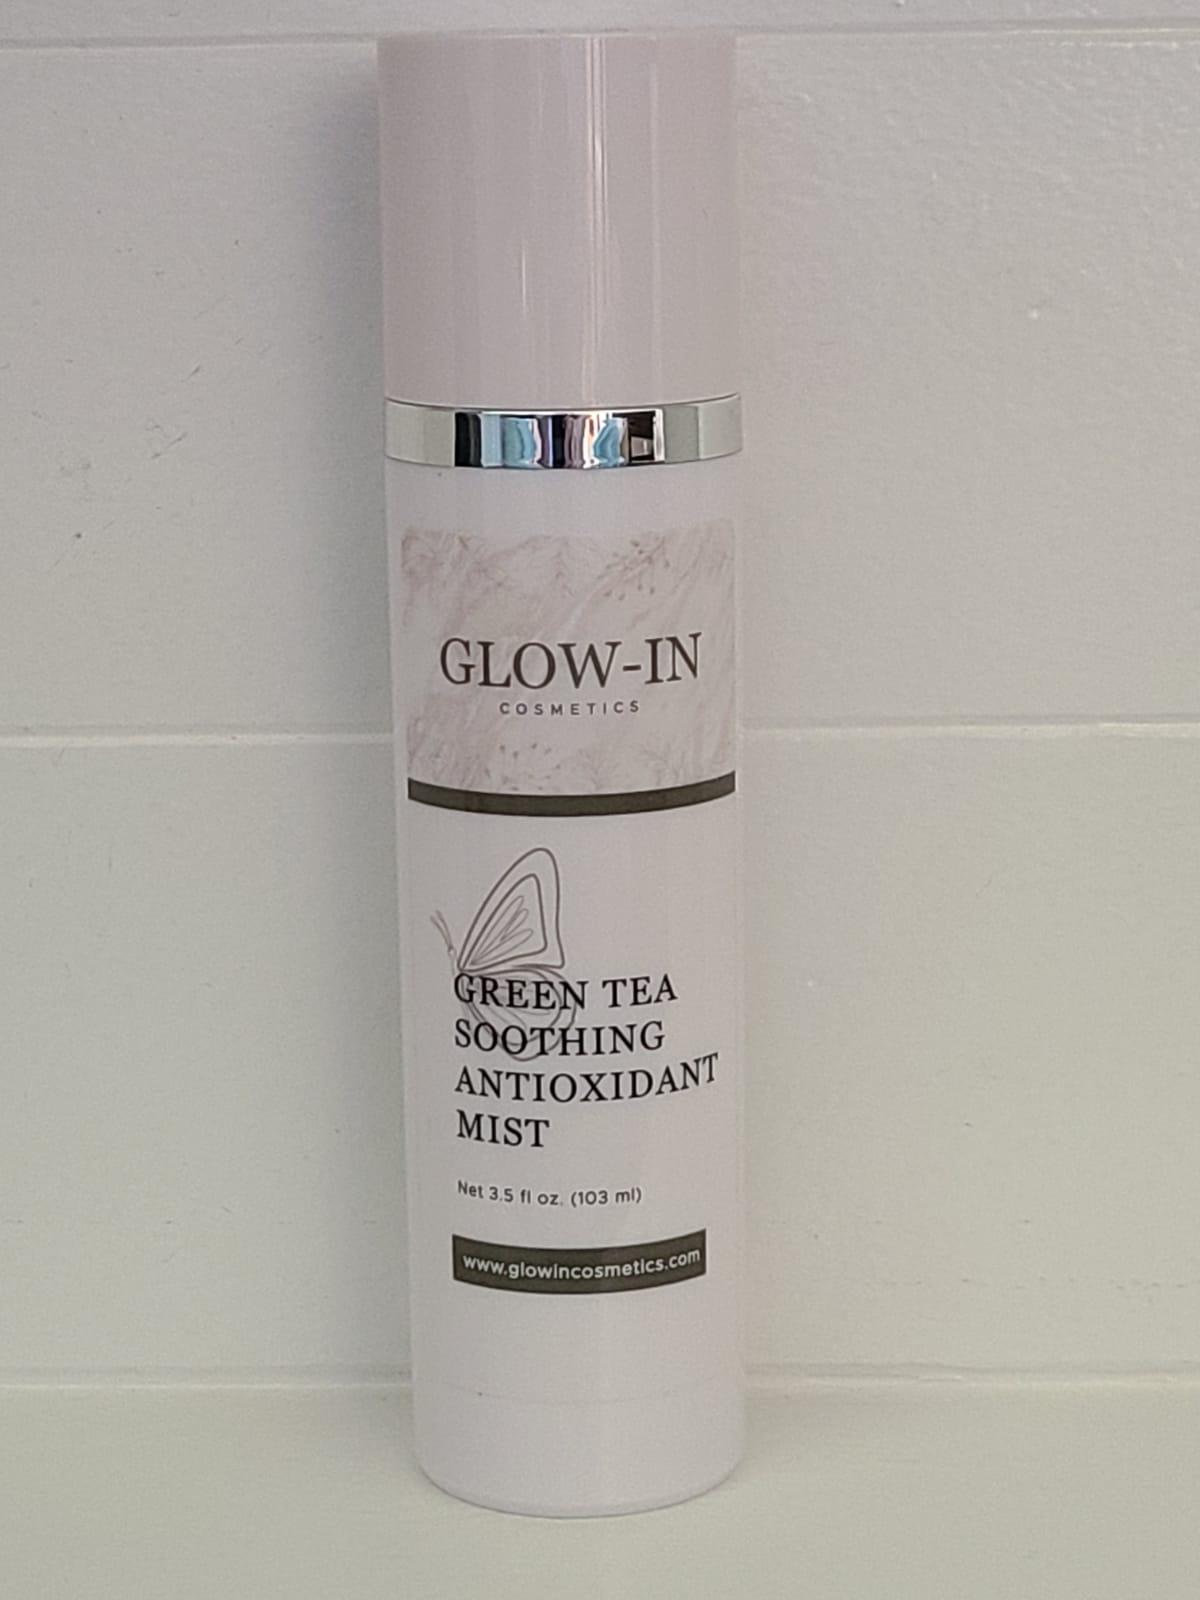 Green Tea Soothing Antioxidant Mist